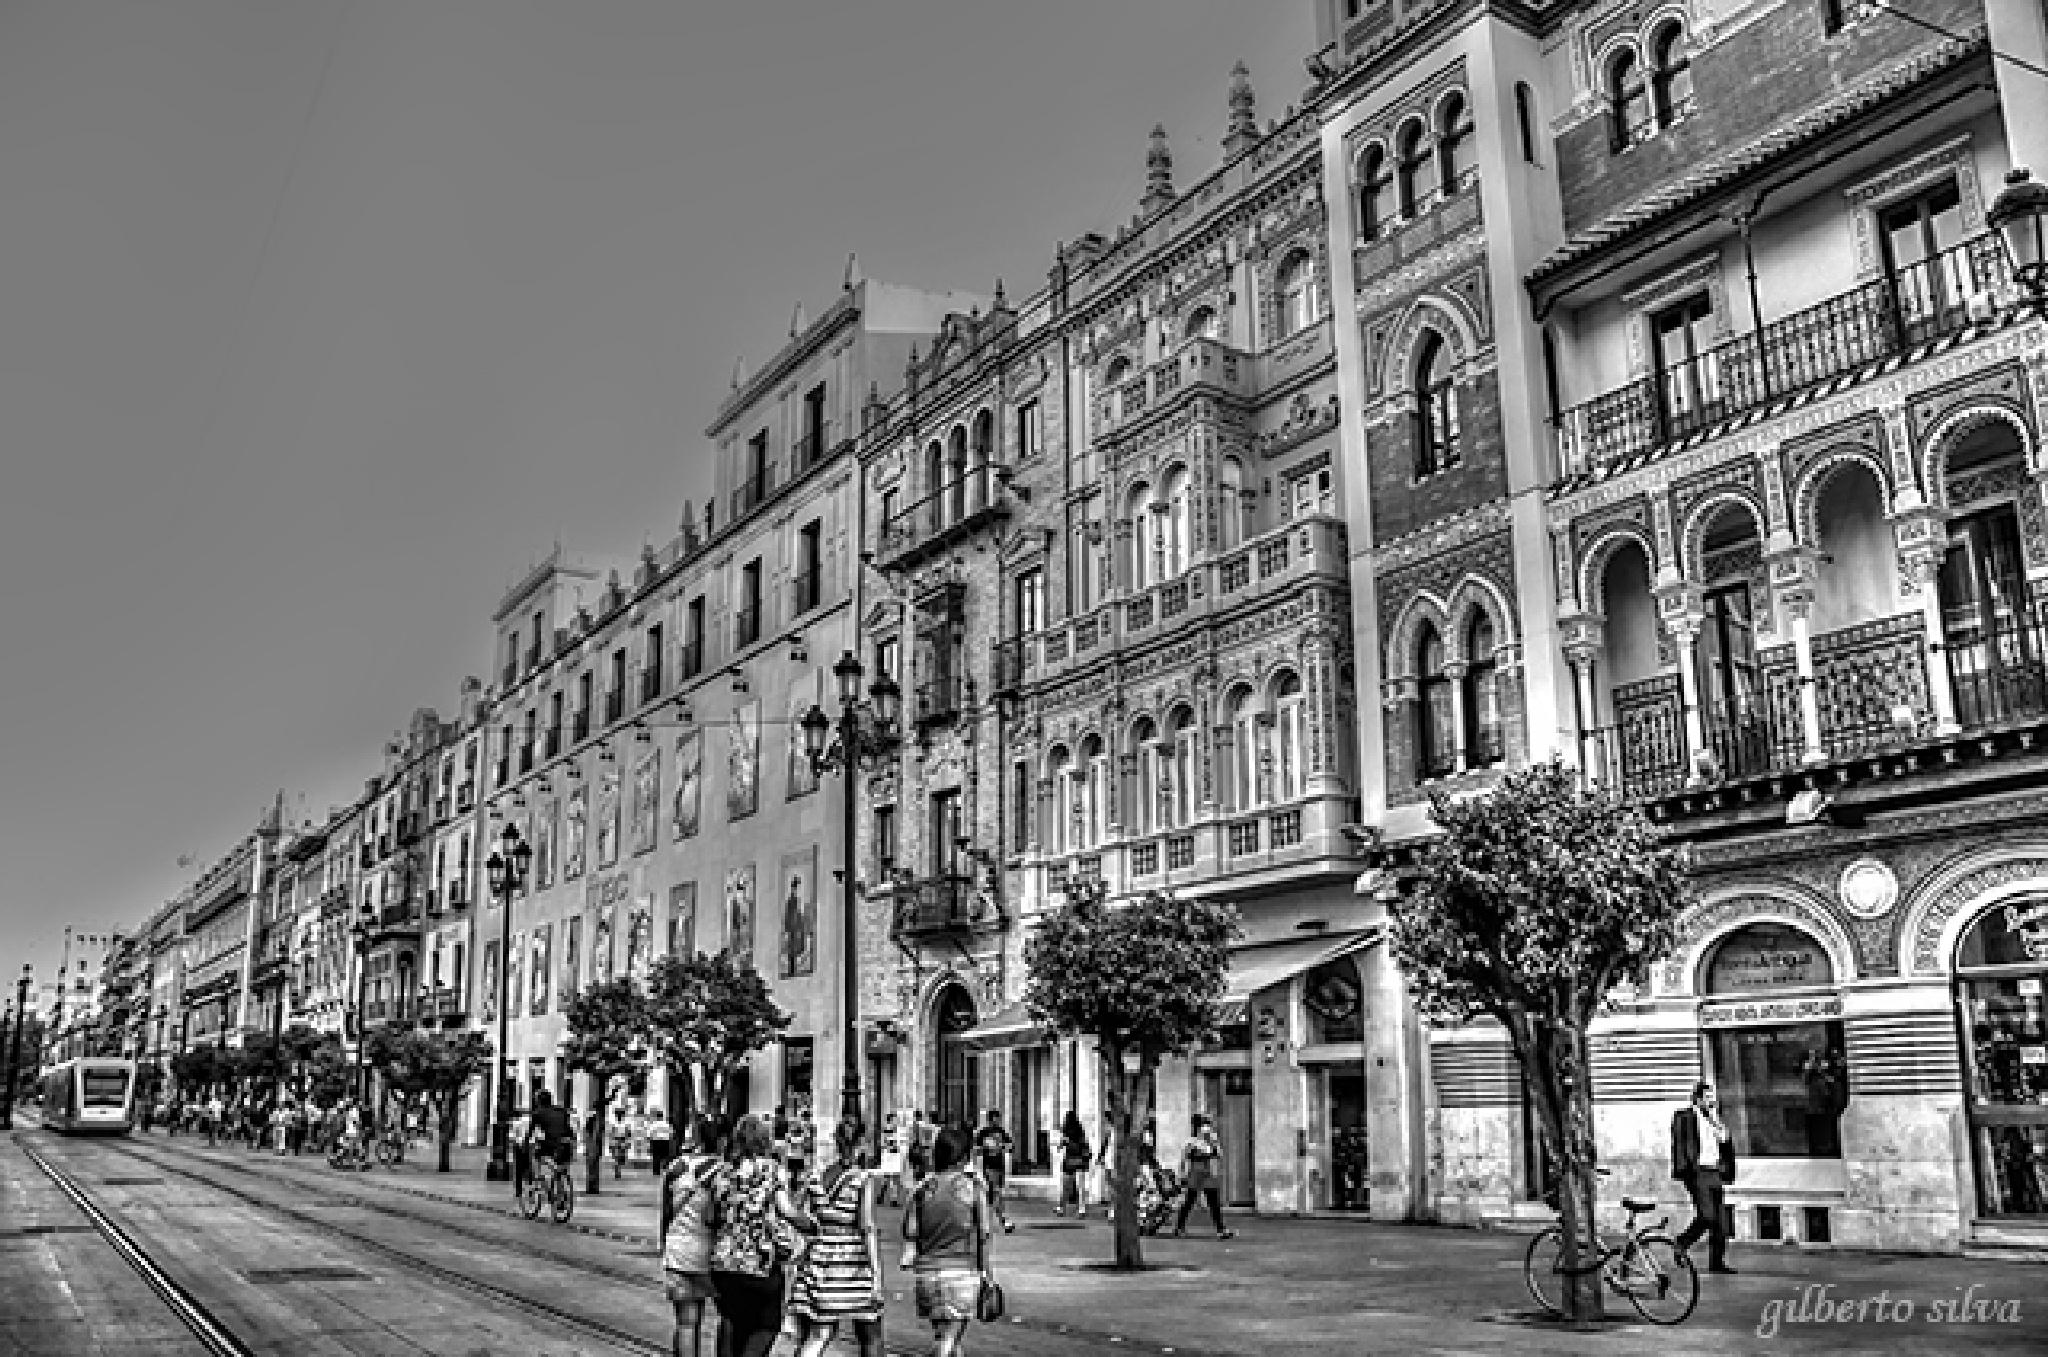 walking around town by Rui Santos Silva